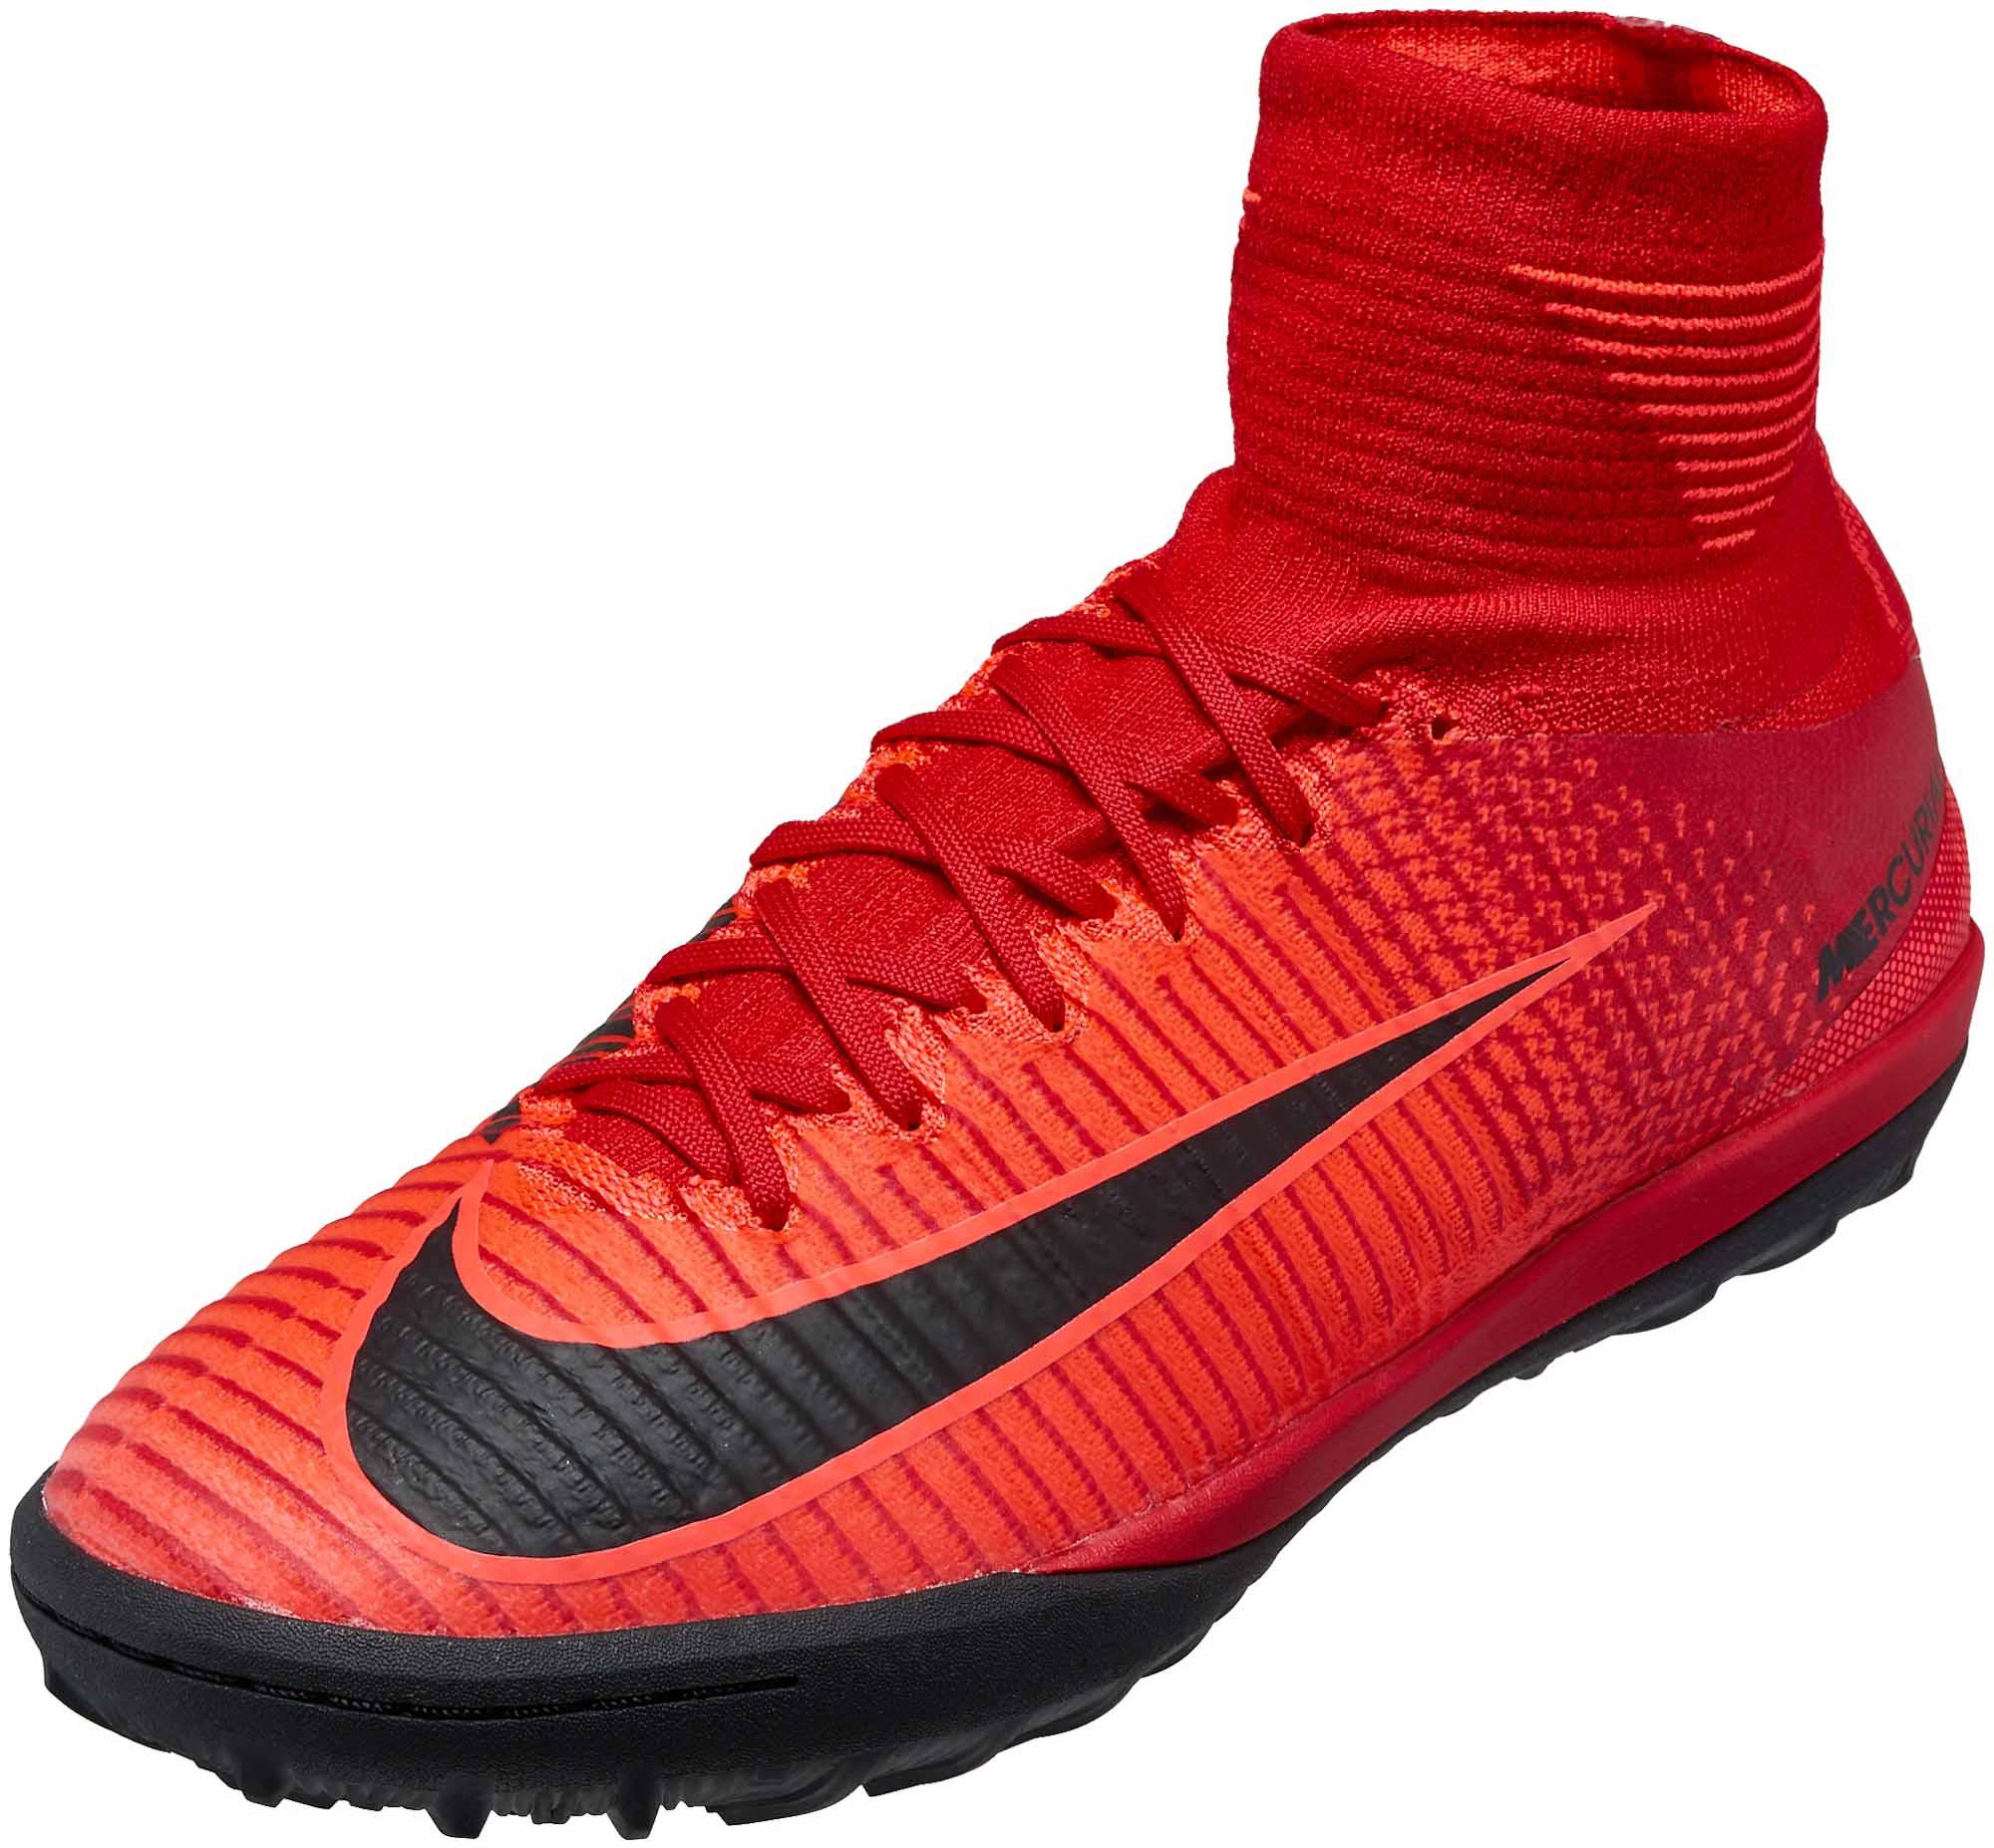 big sale 4de0b 75e98 Nike MercurialX Proximo II TF - University Red & Black